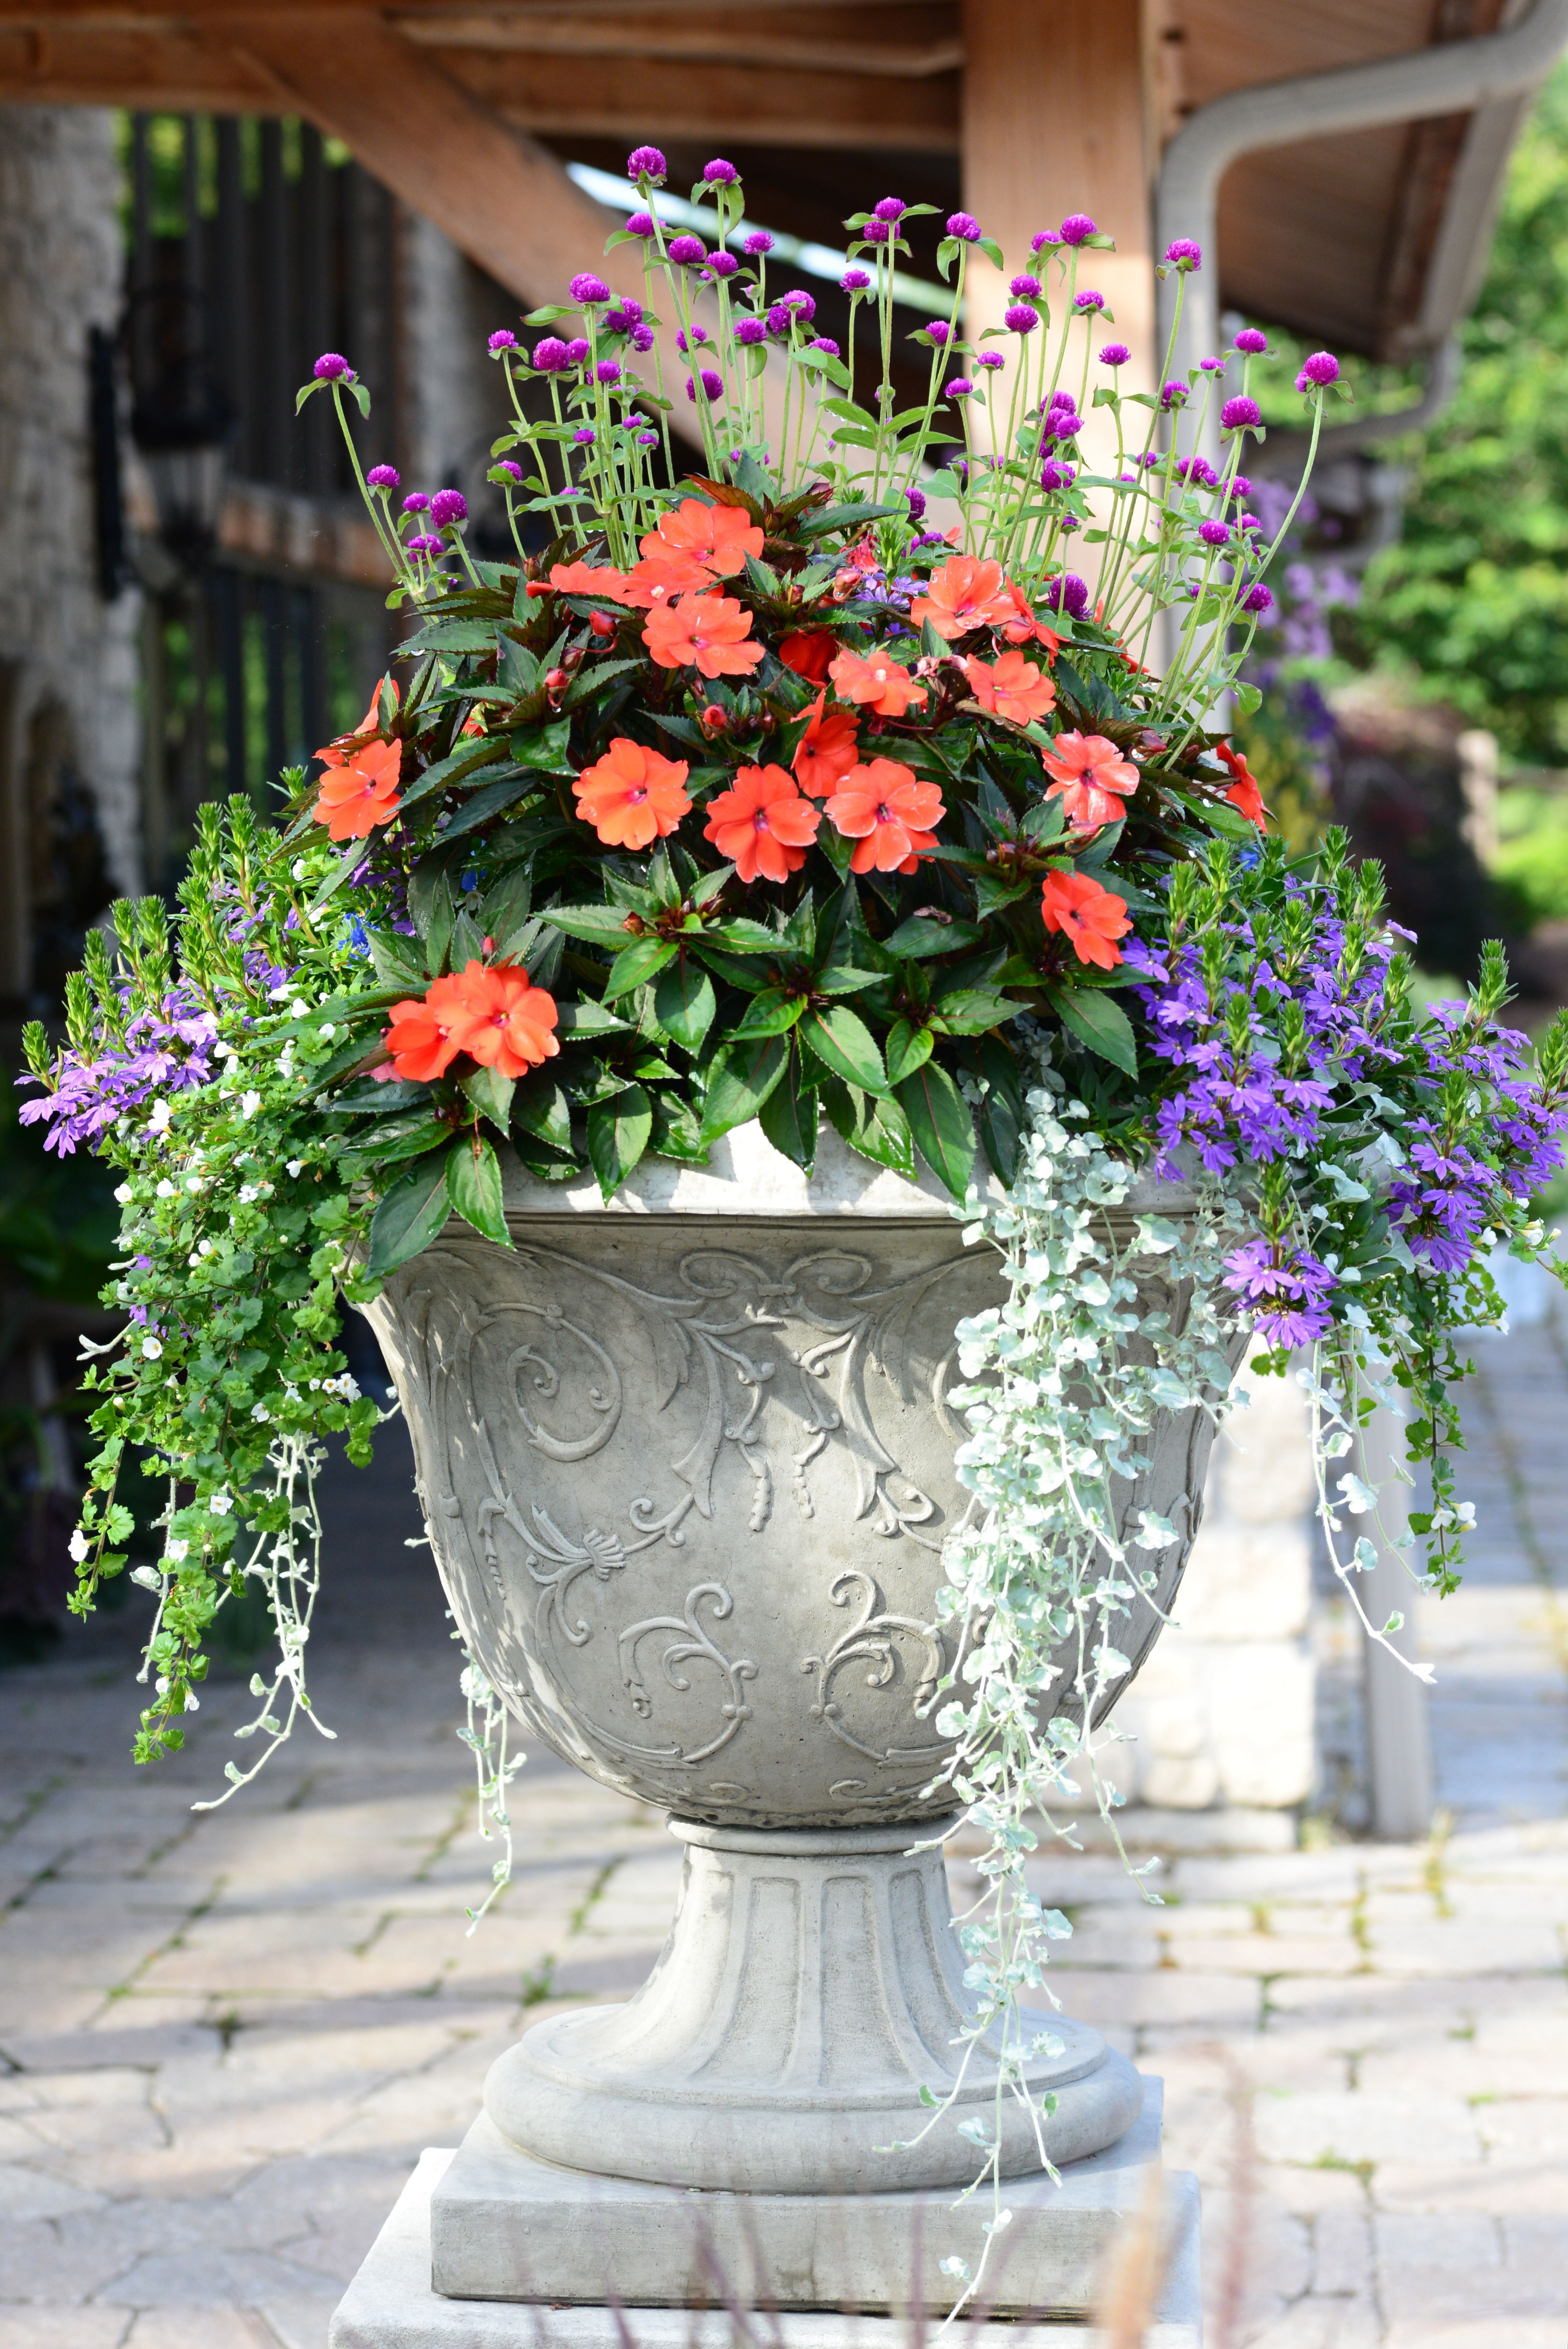 Ornate Concrete Mixed Planter Mixed Flower Pots Flower Pots Flower Planters